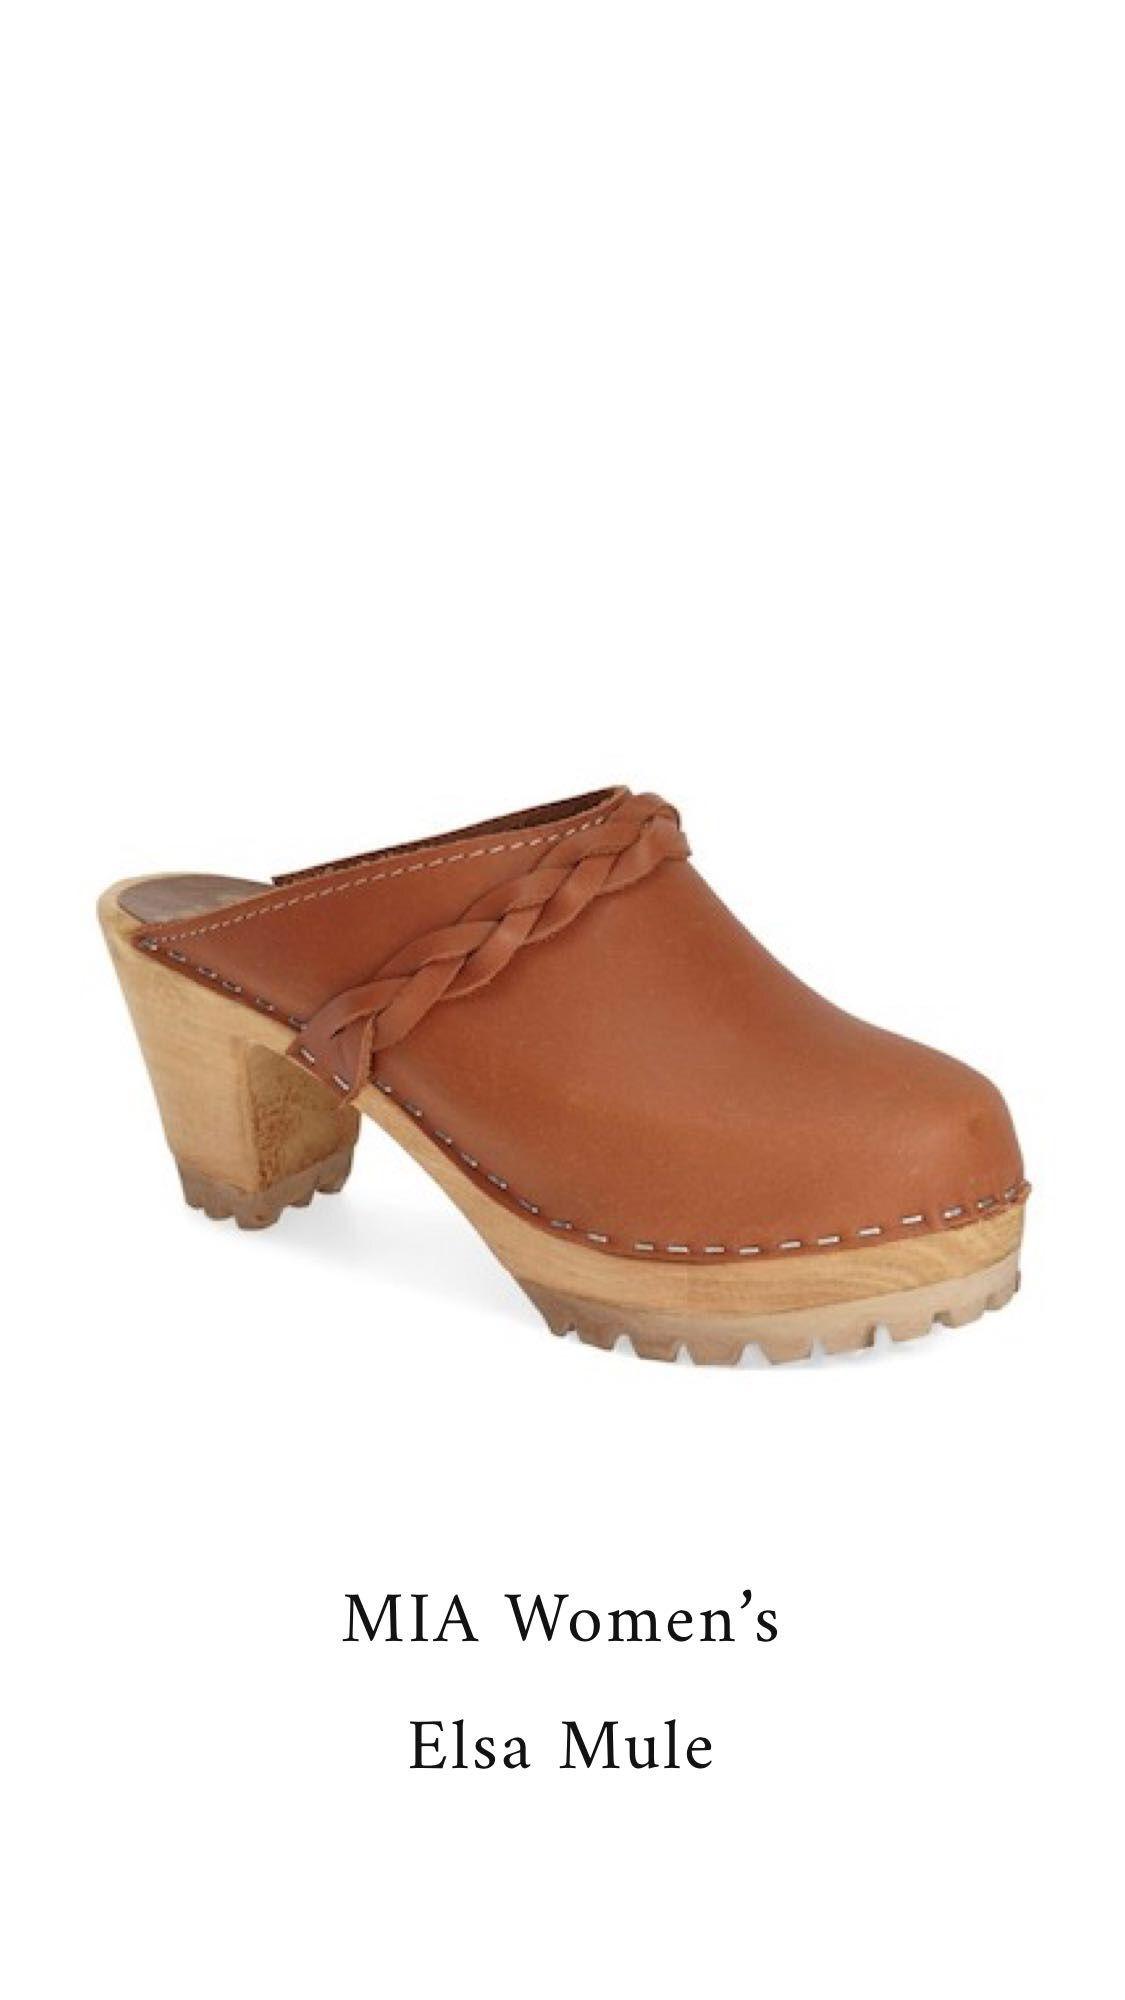 MIA Women's Elsa Mule #KennethCole #Mules #Shoes #Summer